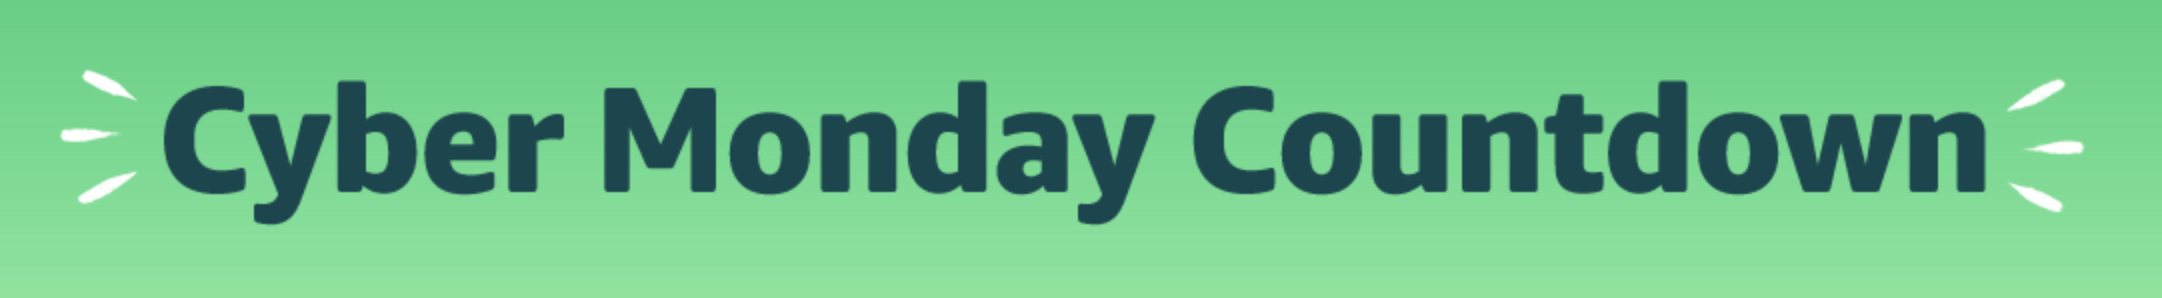 cyber monday countdown 2019